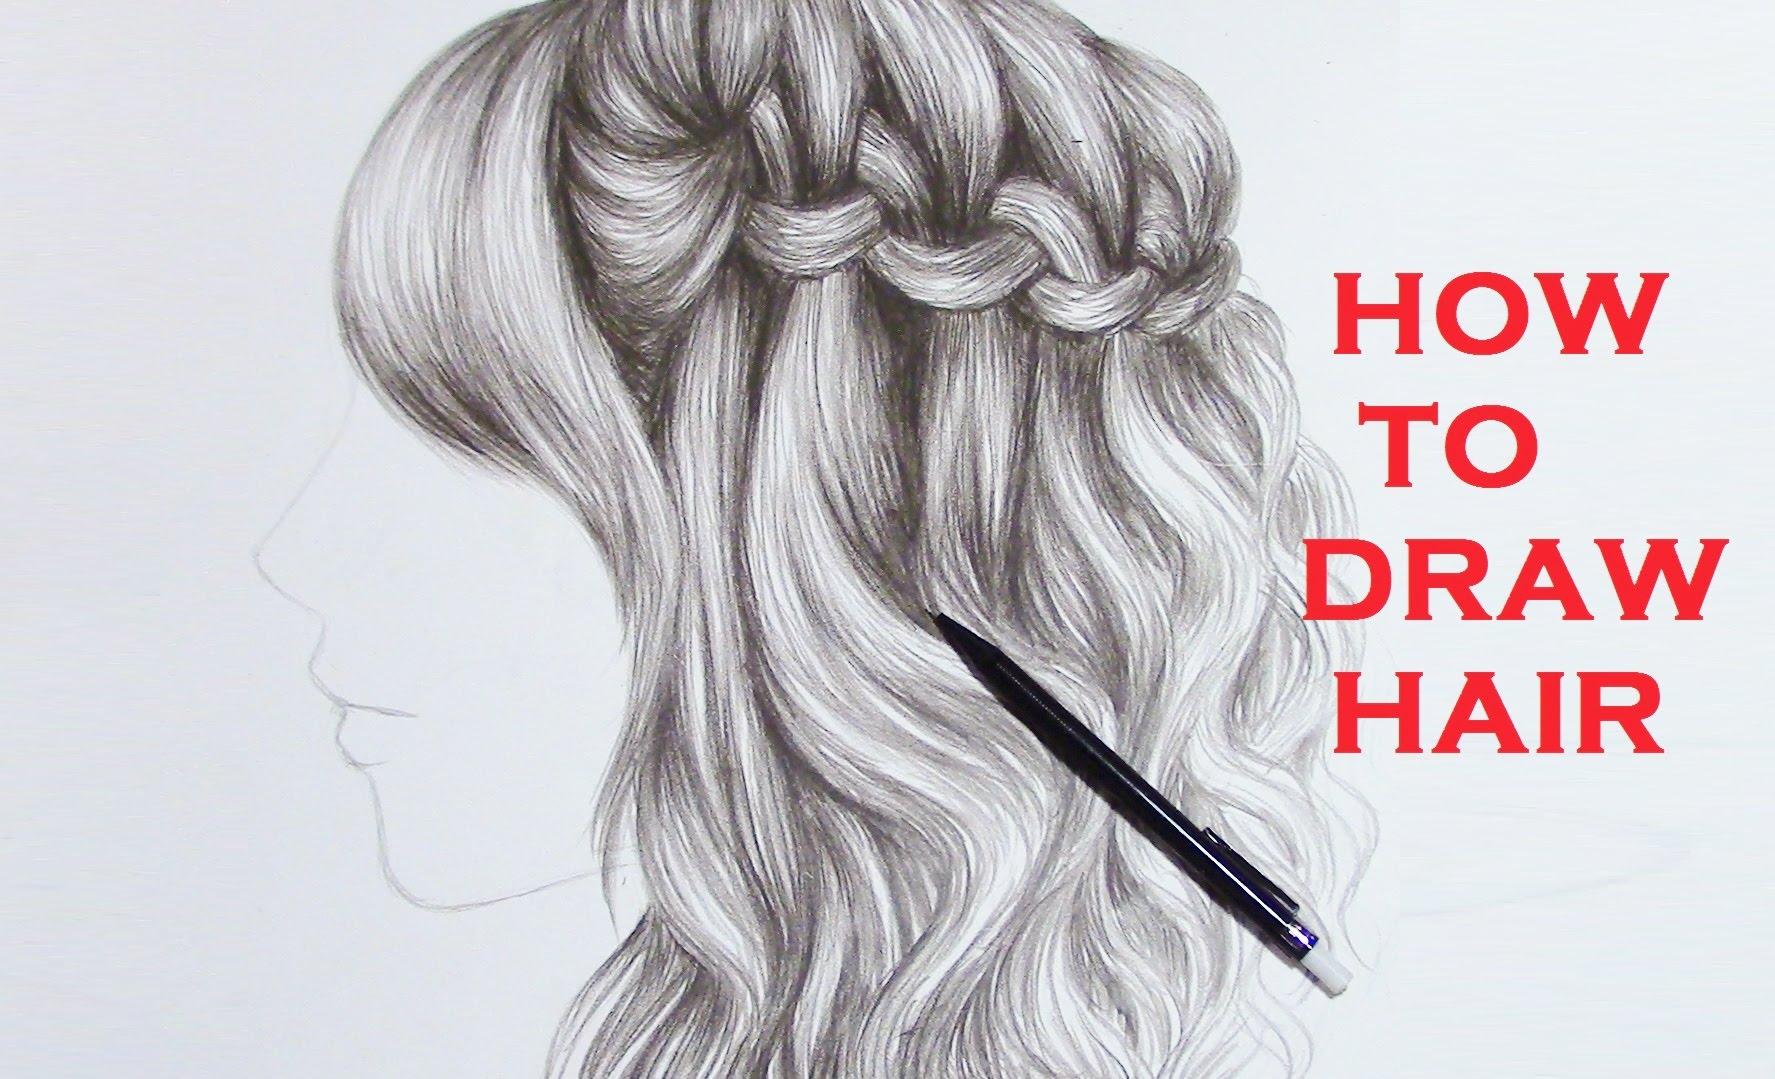 1775x1079 Curly Hair Drawings Drawing Braid Curly Hair (Realistic)